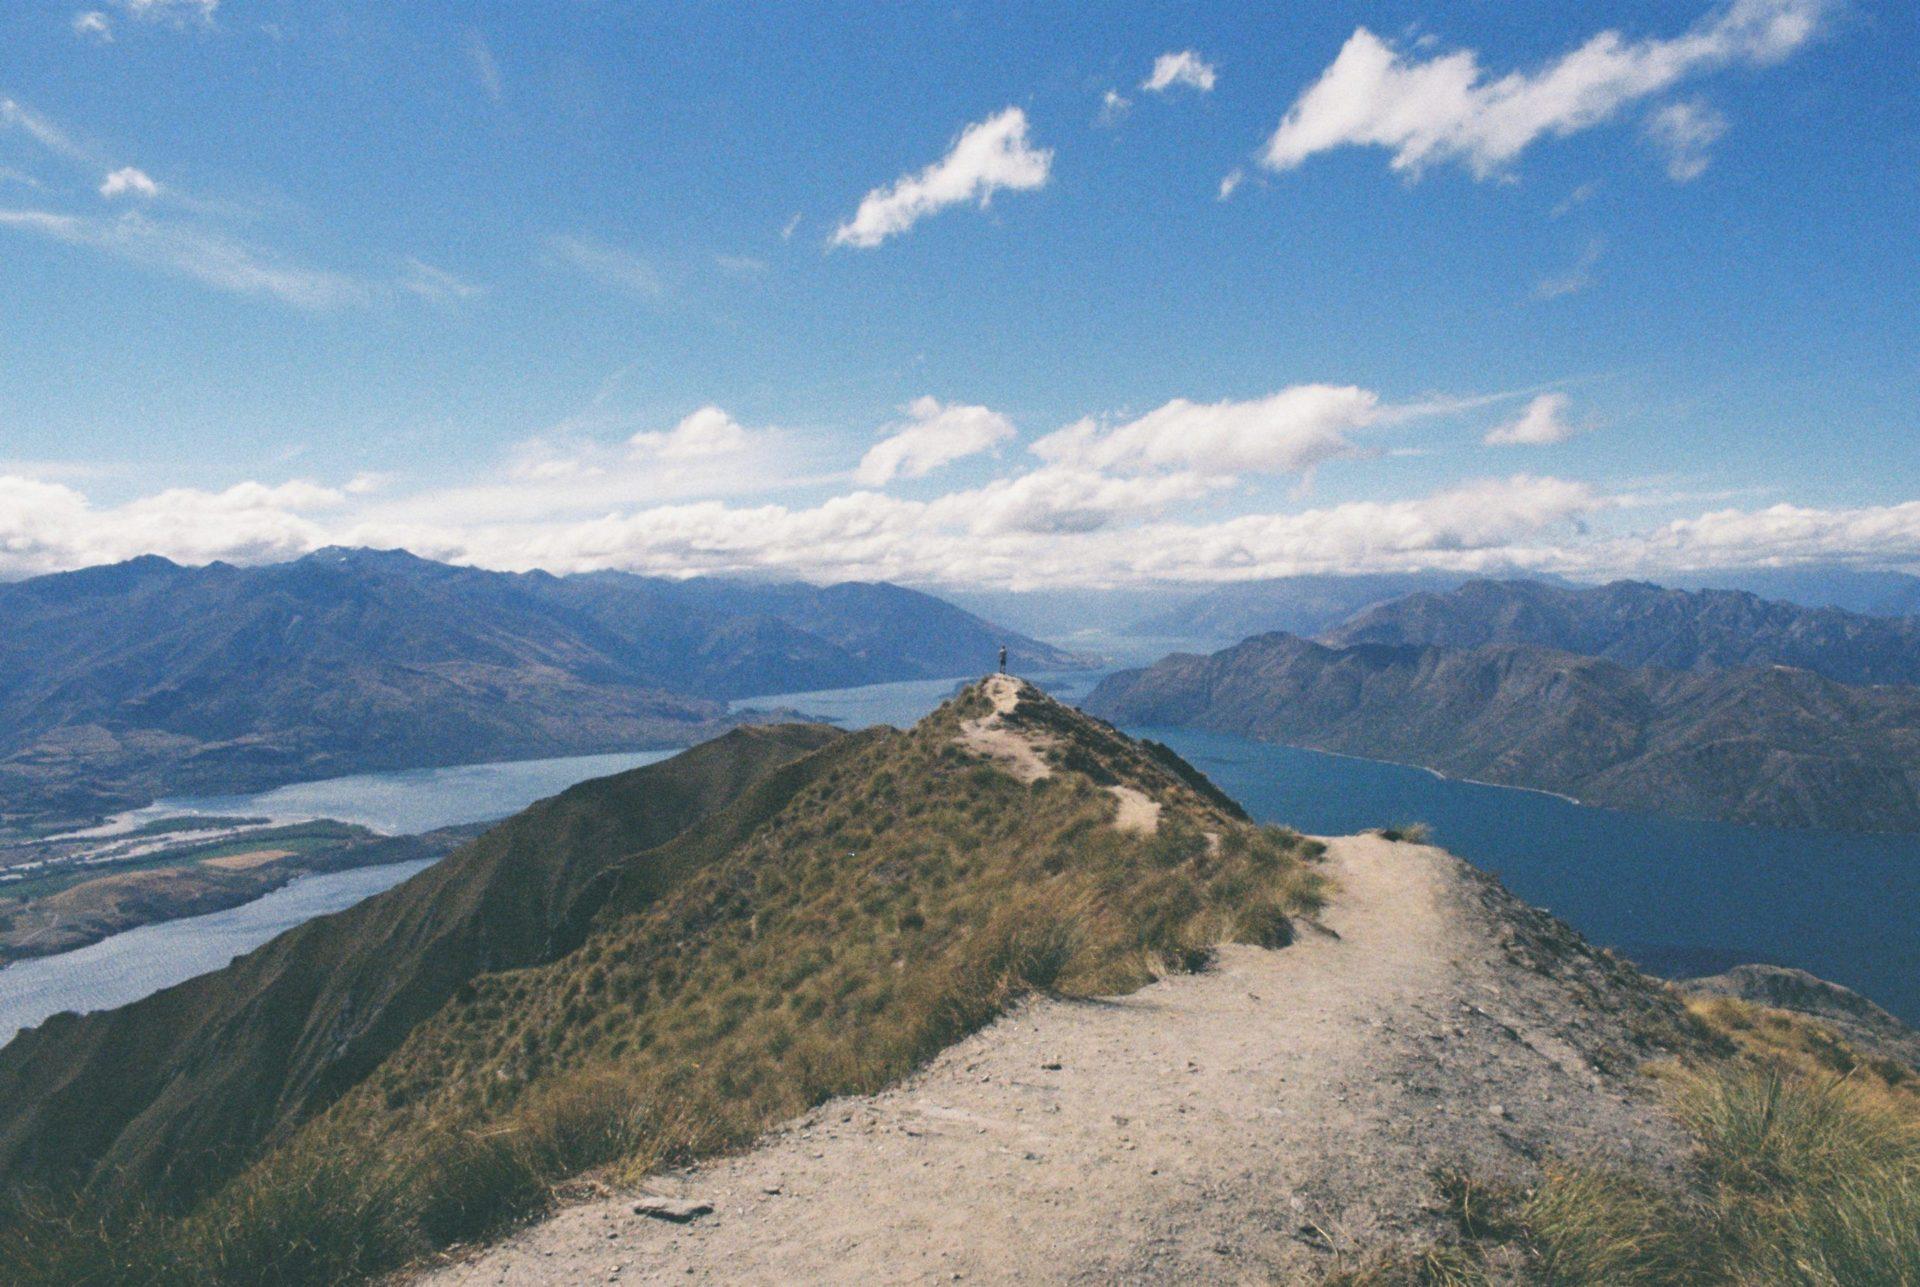 Nova Zelândia curiosidade peculiariedades